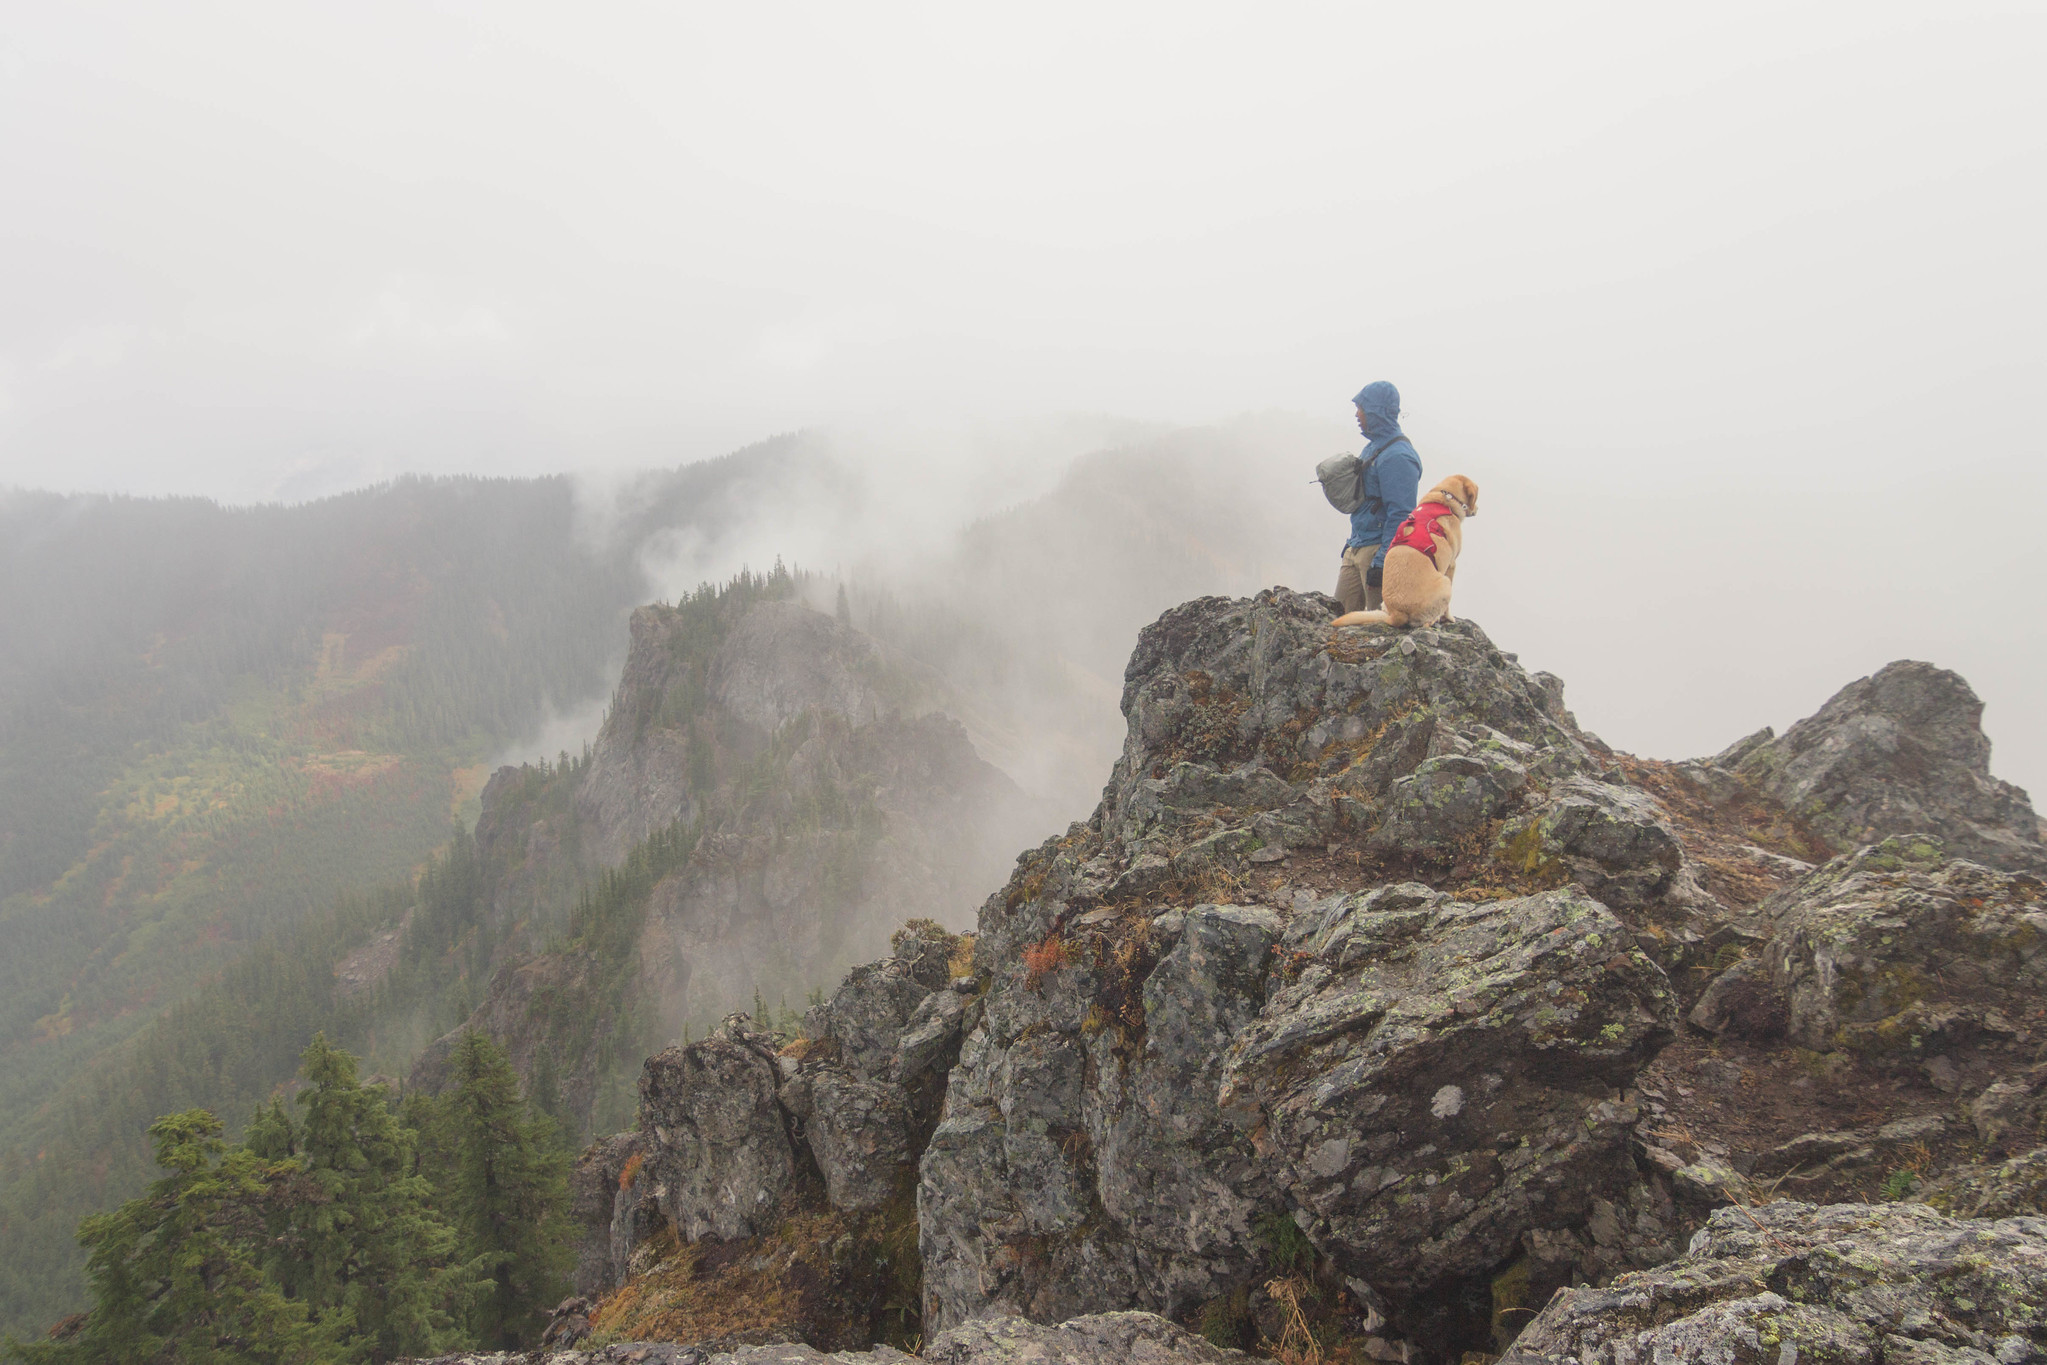 Kodak moment on French Cabin Mountain